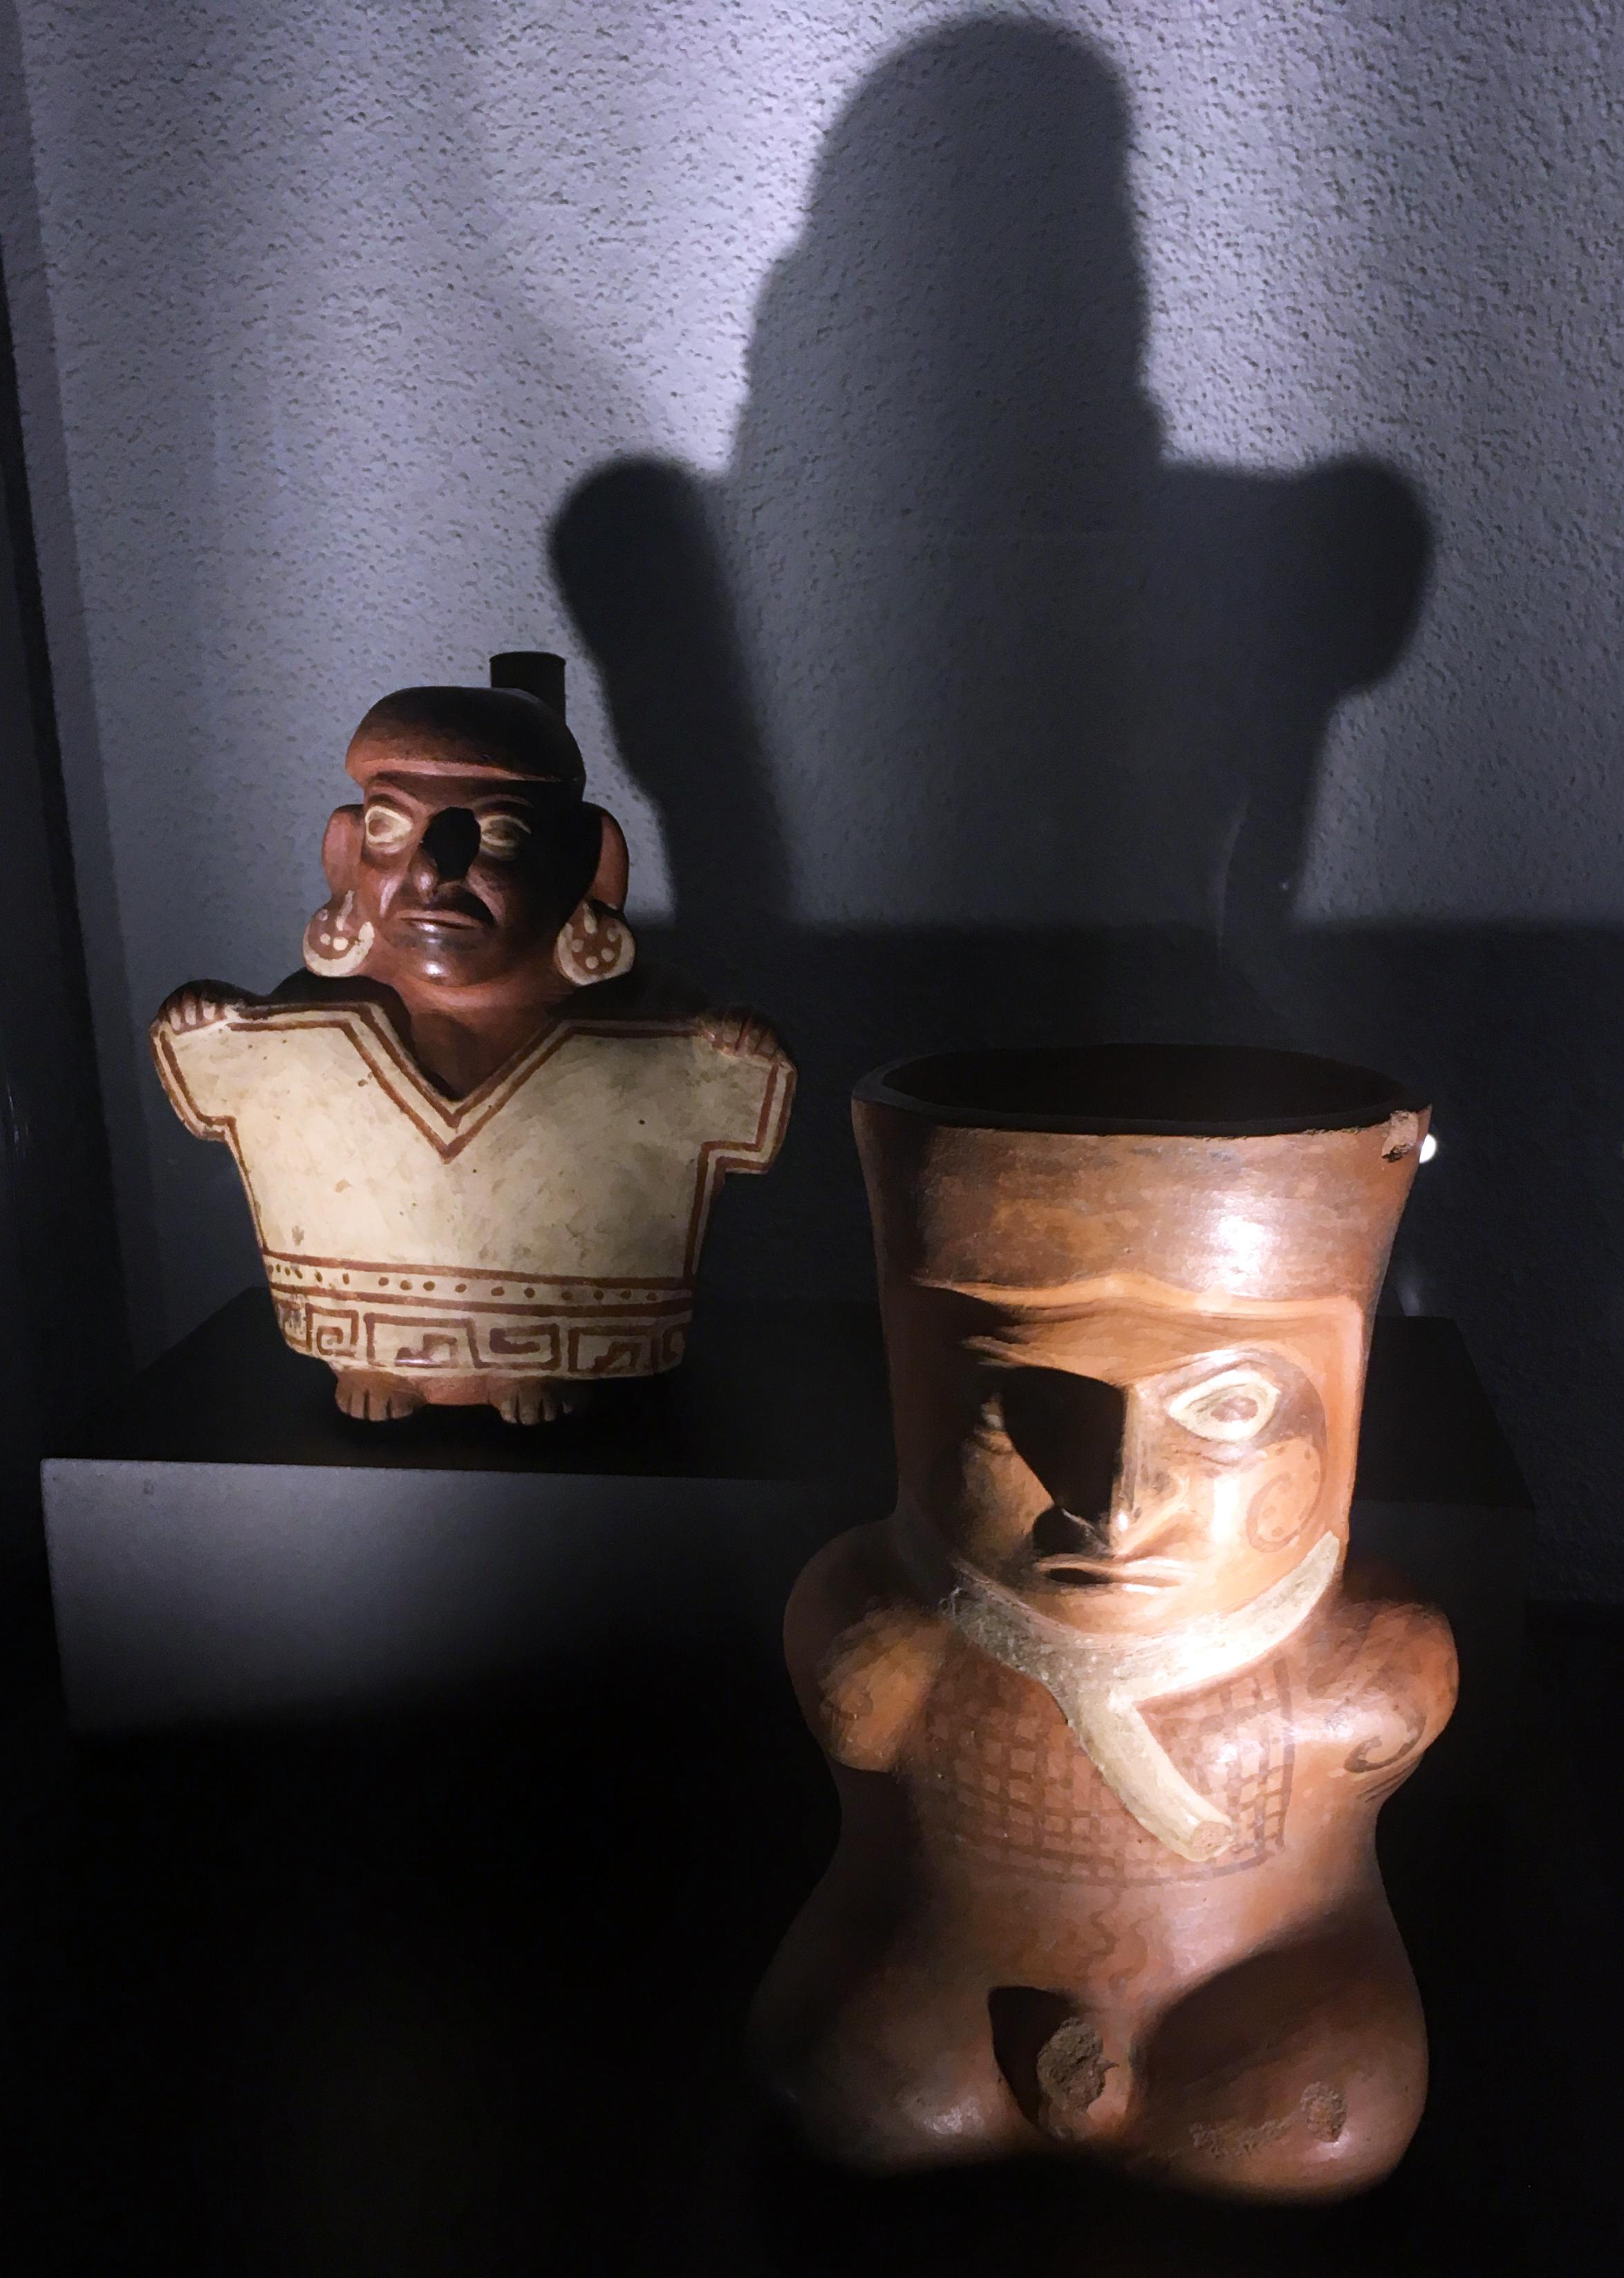 INCA Dress Code , Musée Art & Histoire, vue d'exposition. Photo: Zoé Schreiber